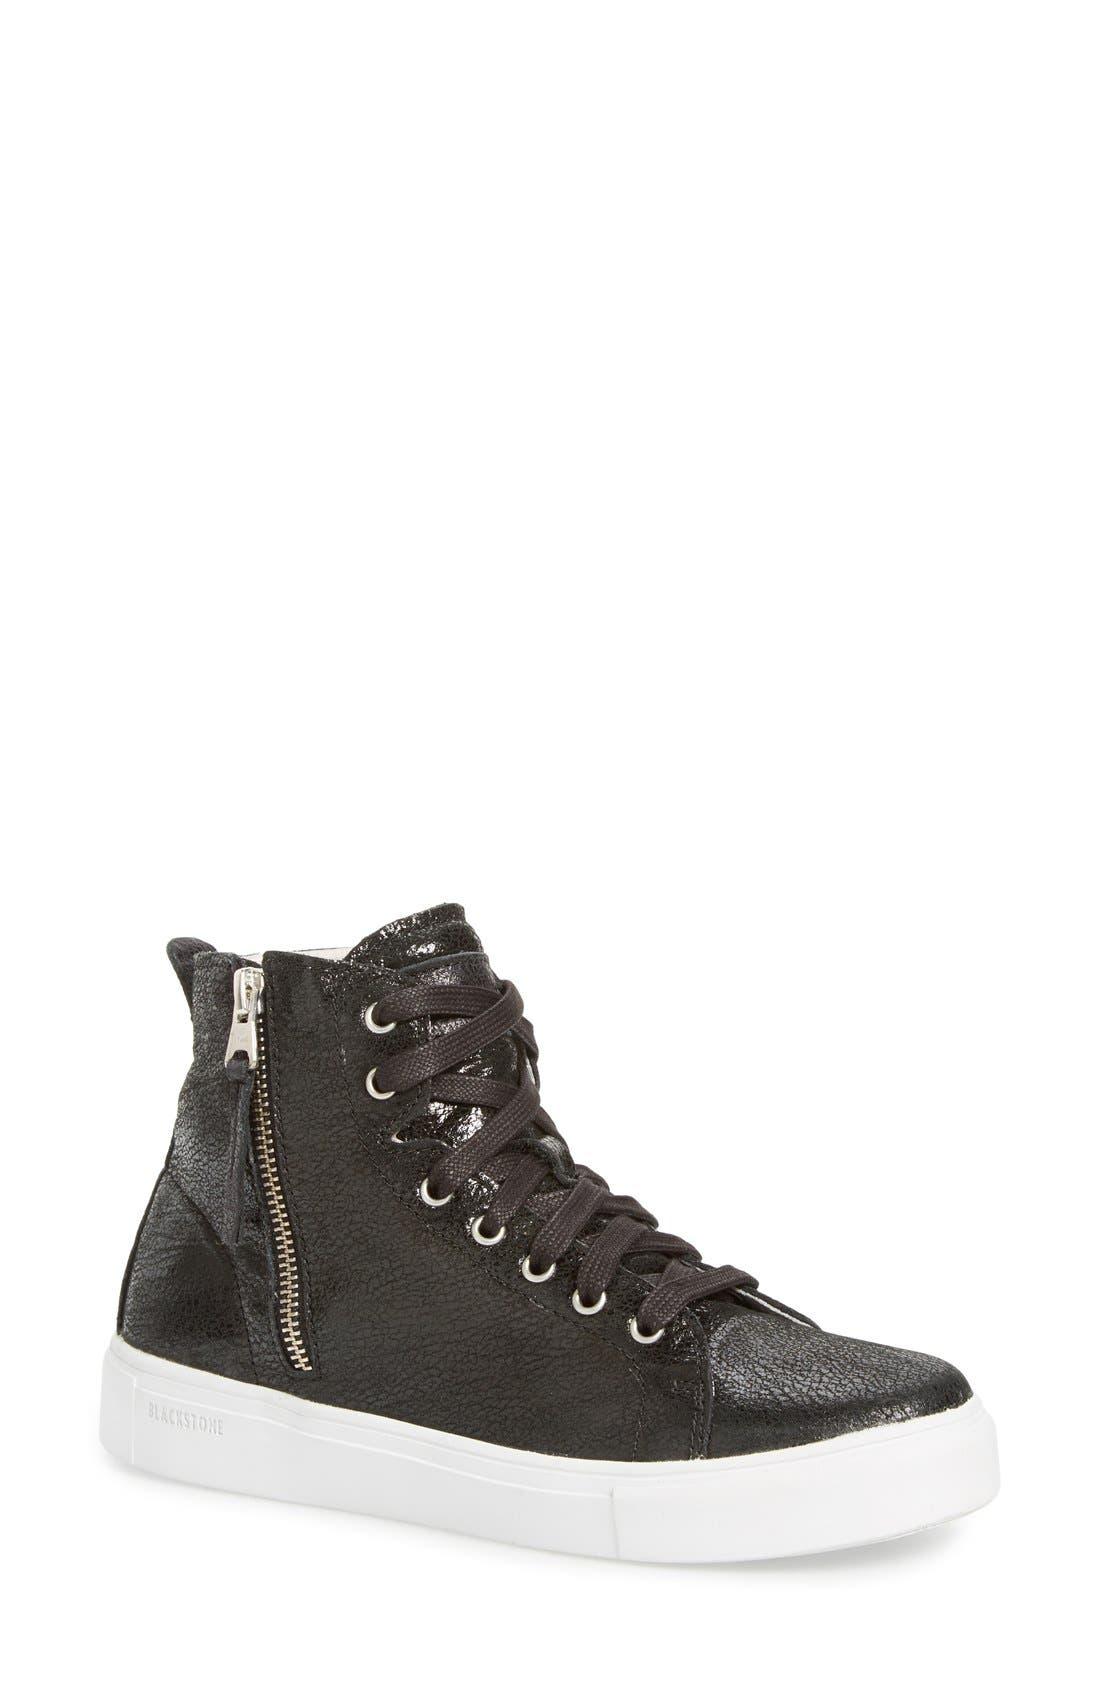 Fast Shipping LL64' Sneaker Women Womens Black Leather Blackstone Womens Comfort